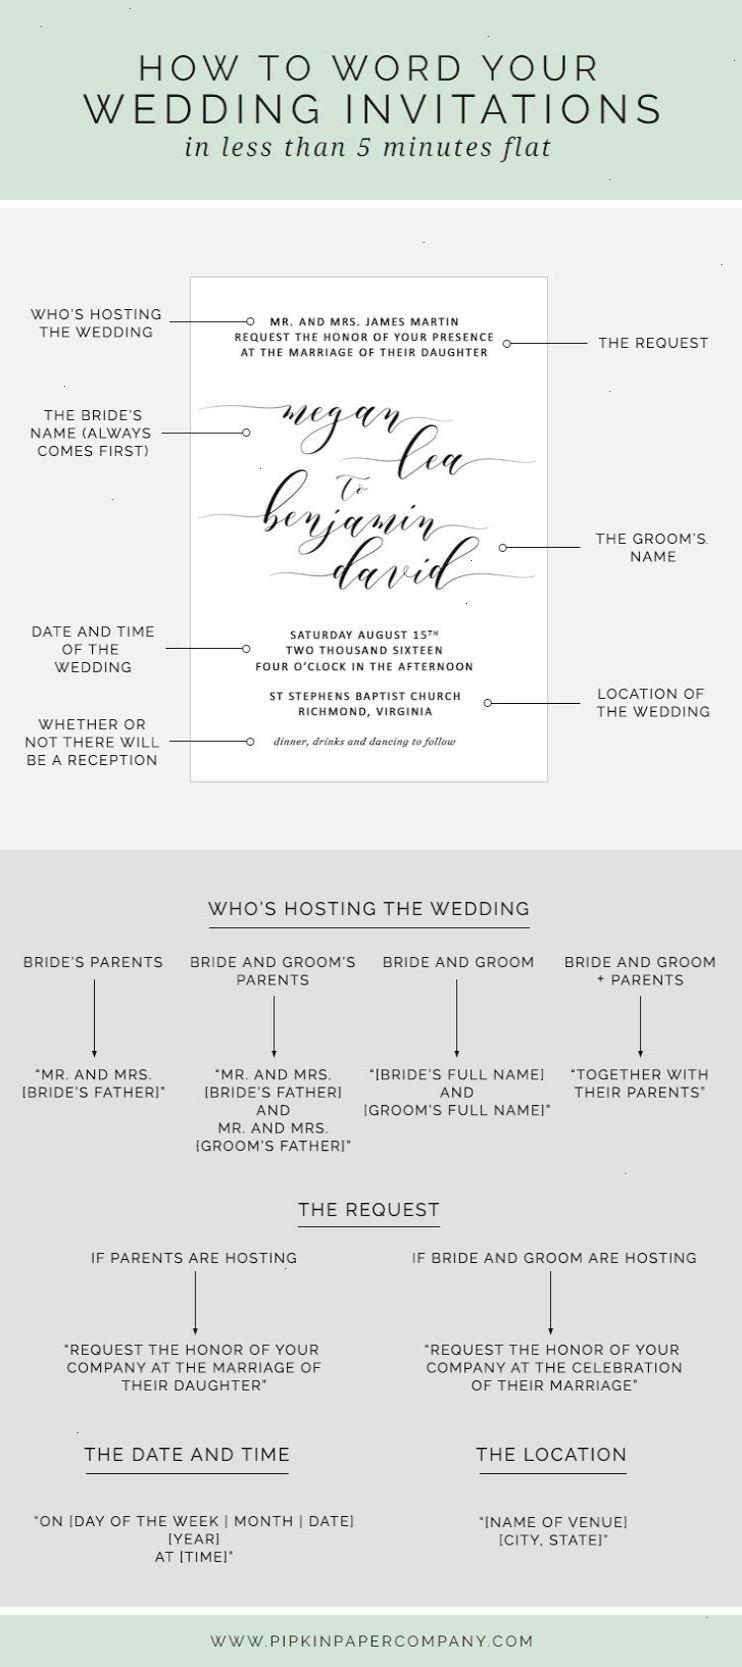 found wedding invitations online free wedding invites in 2018